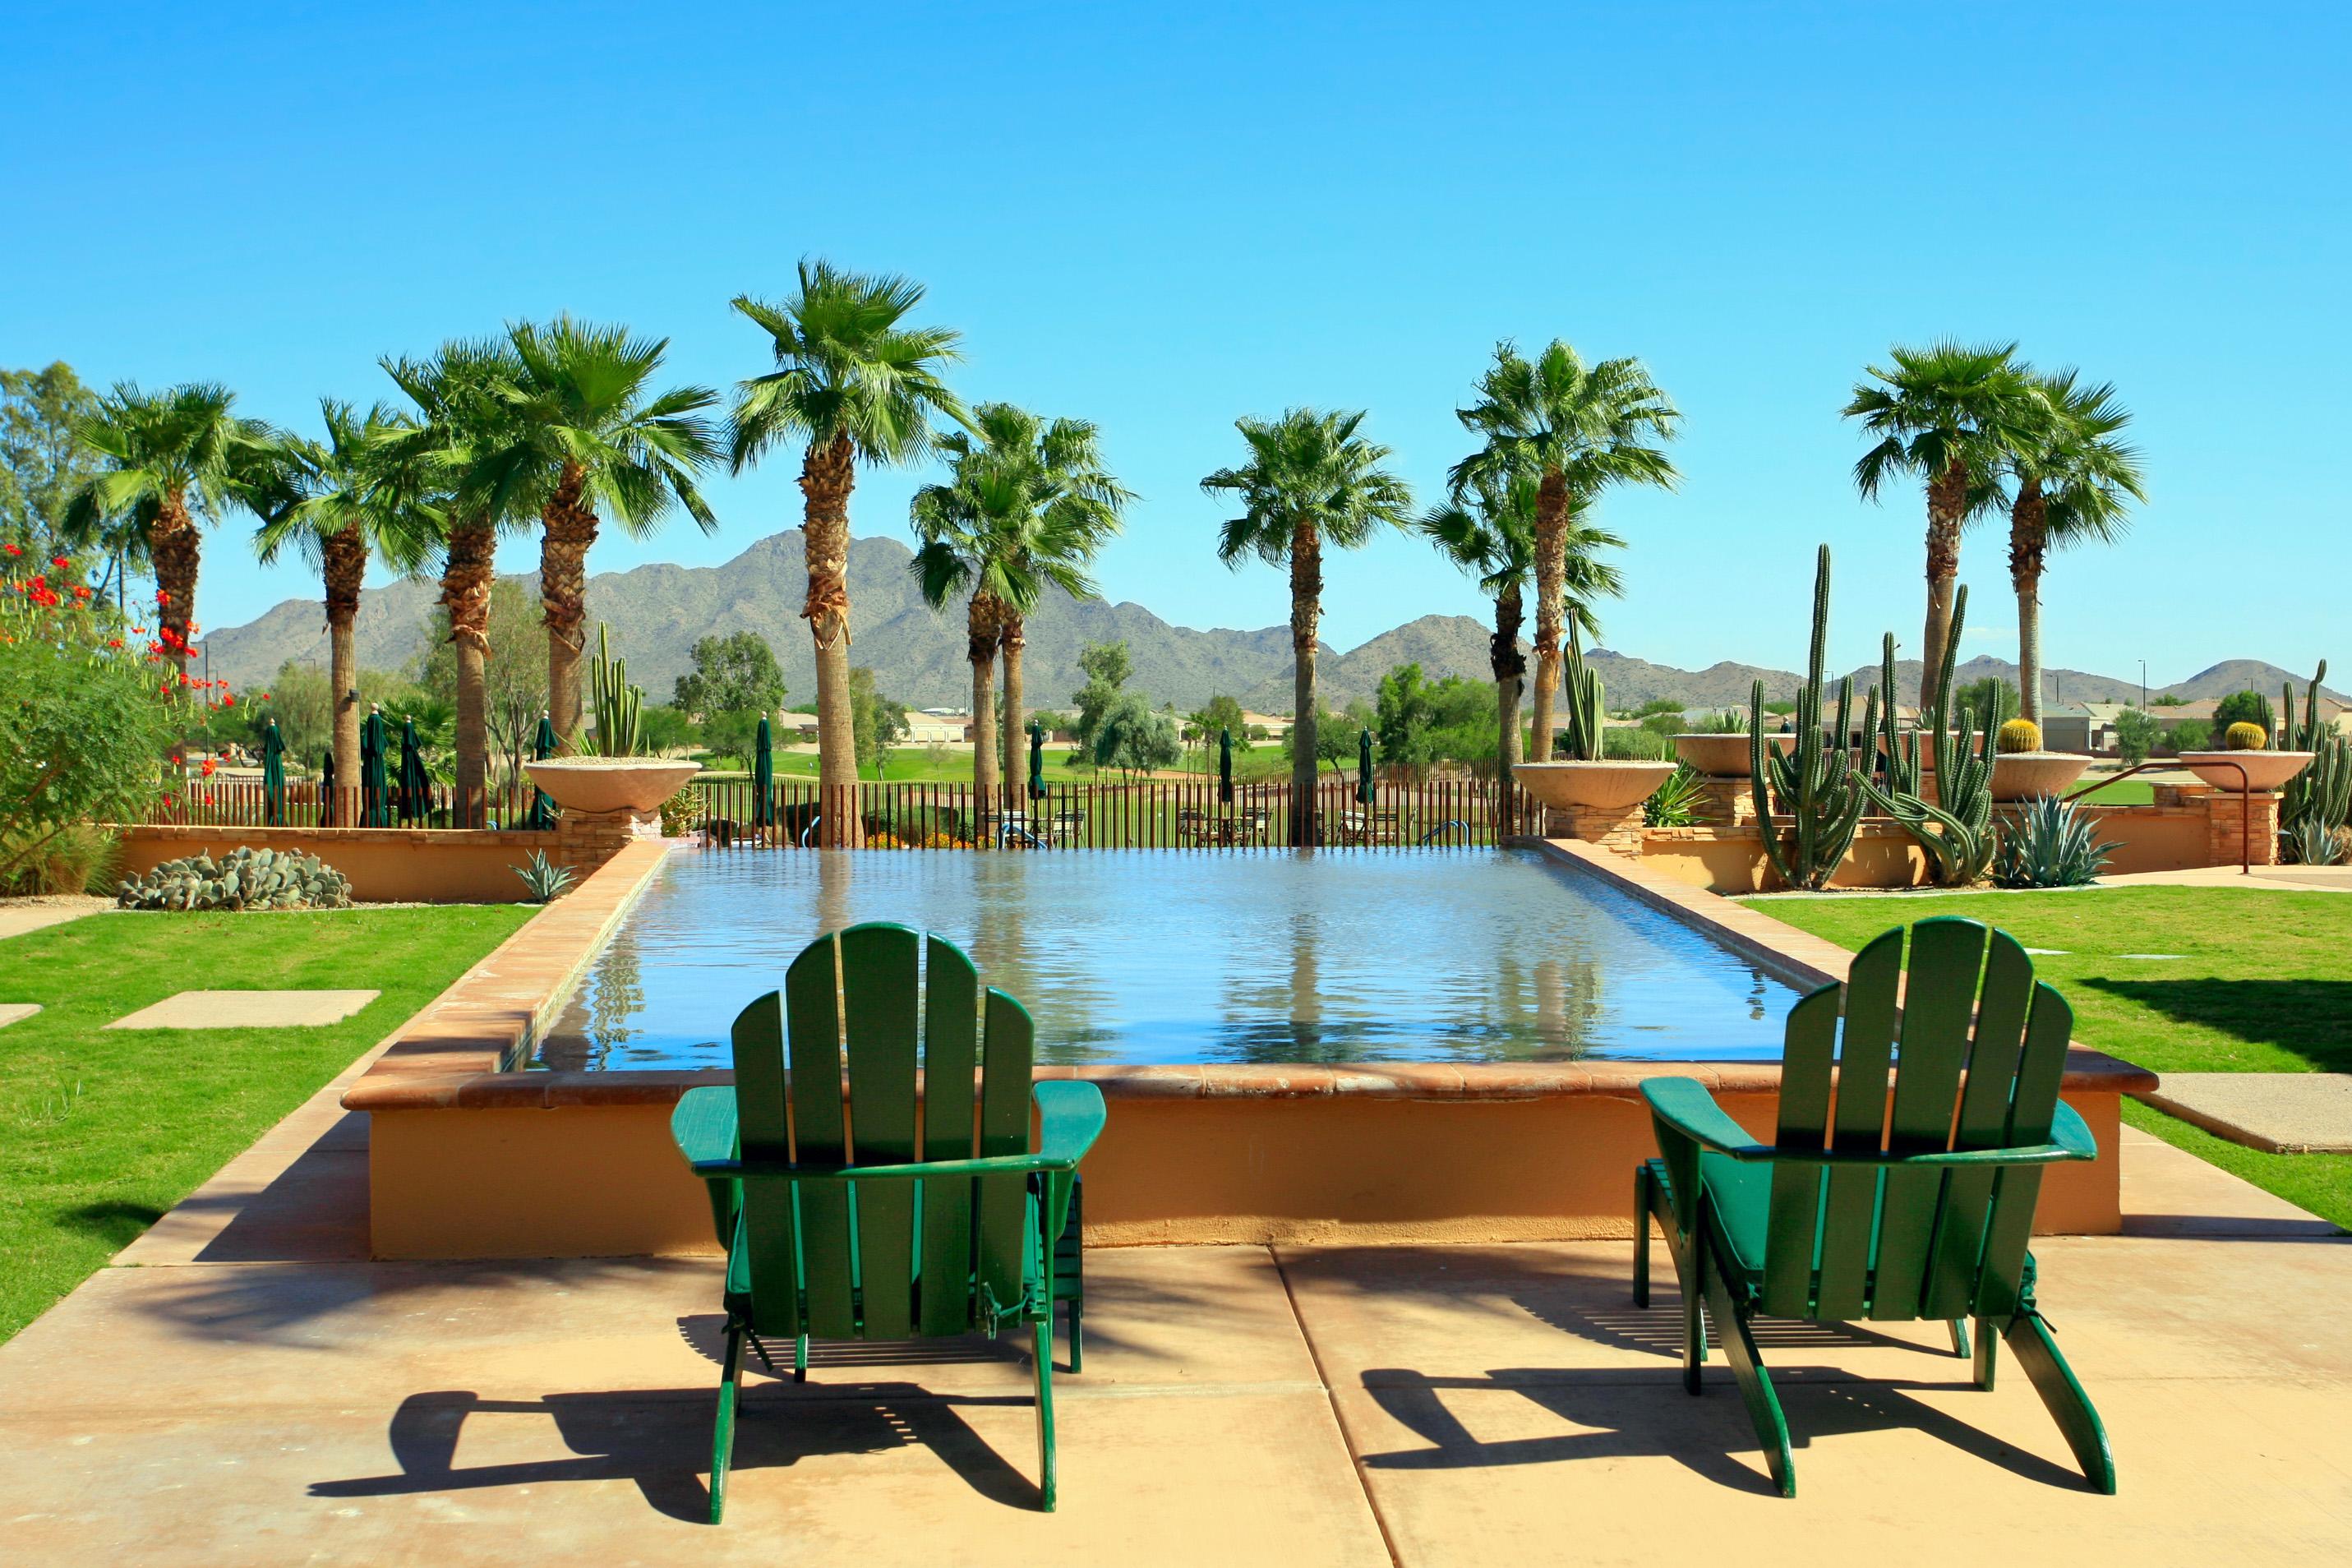 Poolside life in Tatum Ranch Scottsdale AZ